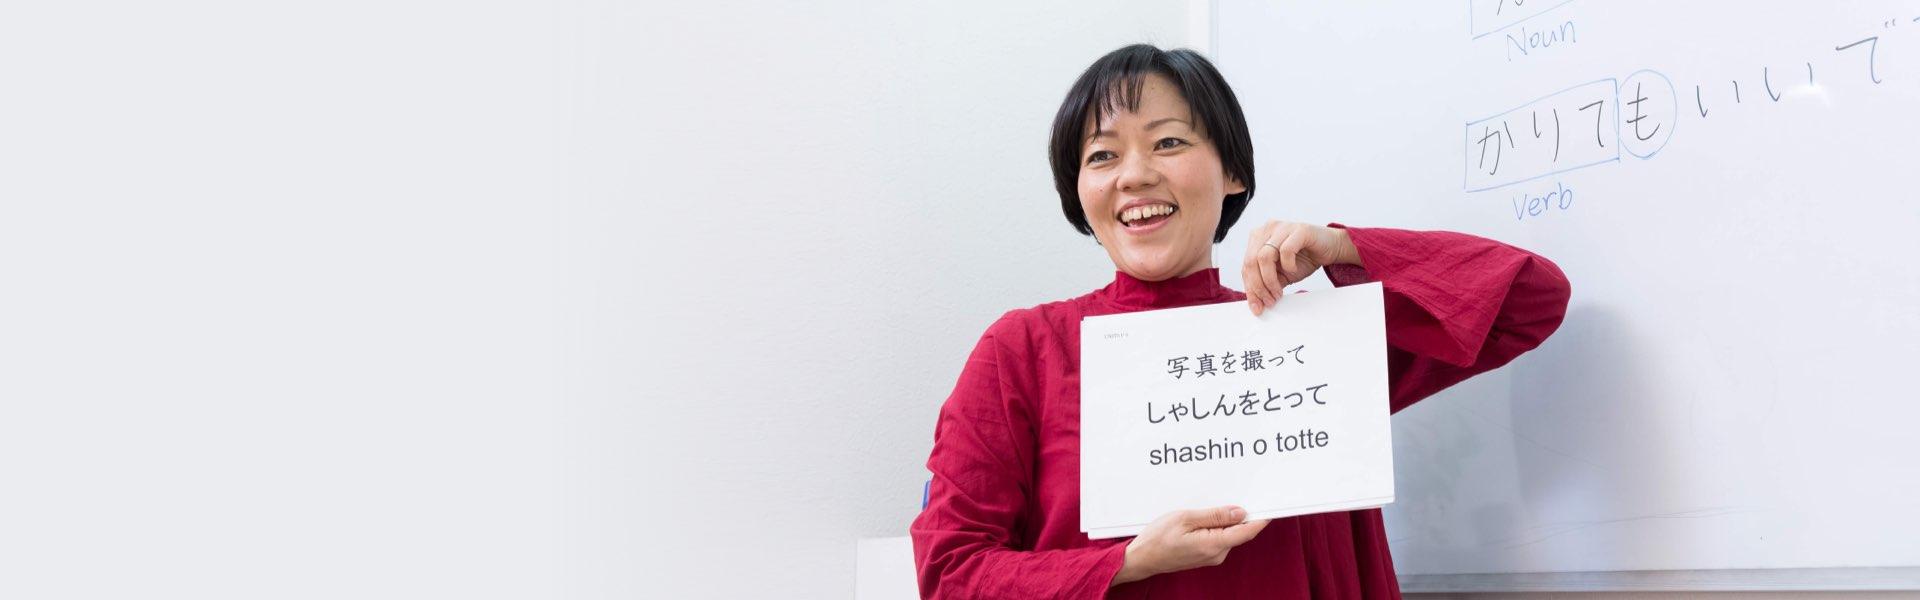 emiko-chikashige-近重-江見子-teacher-teaching-japanese